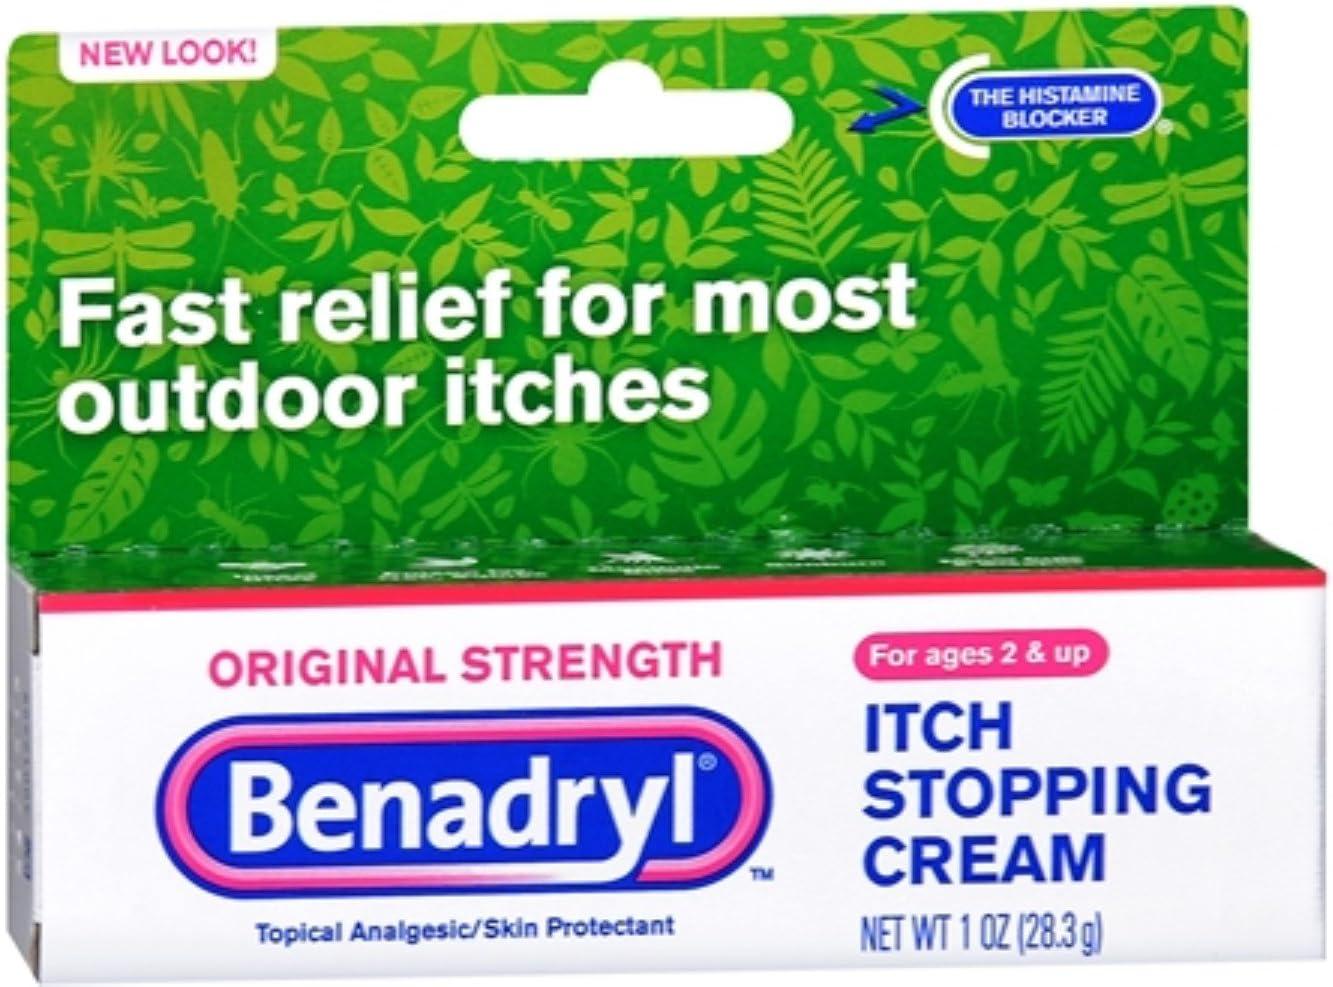 Benadryl Itch Stopping Cream Original Strength 1 oz (Pack of 3)